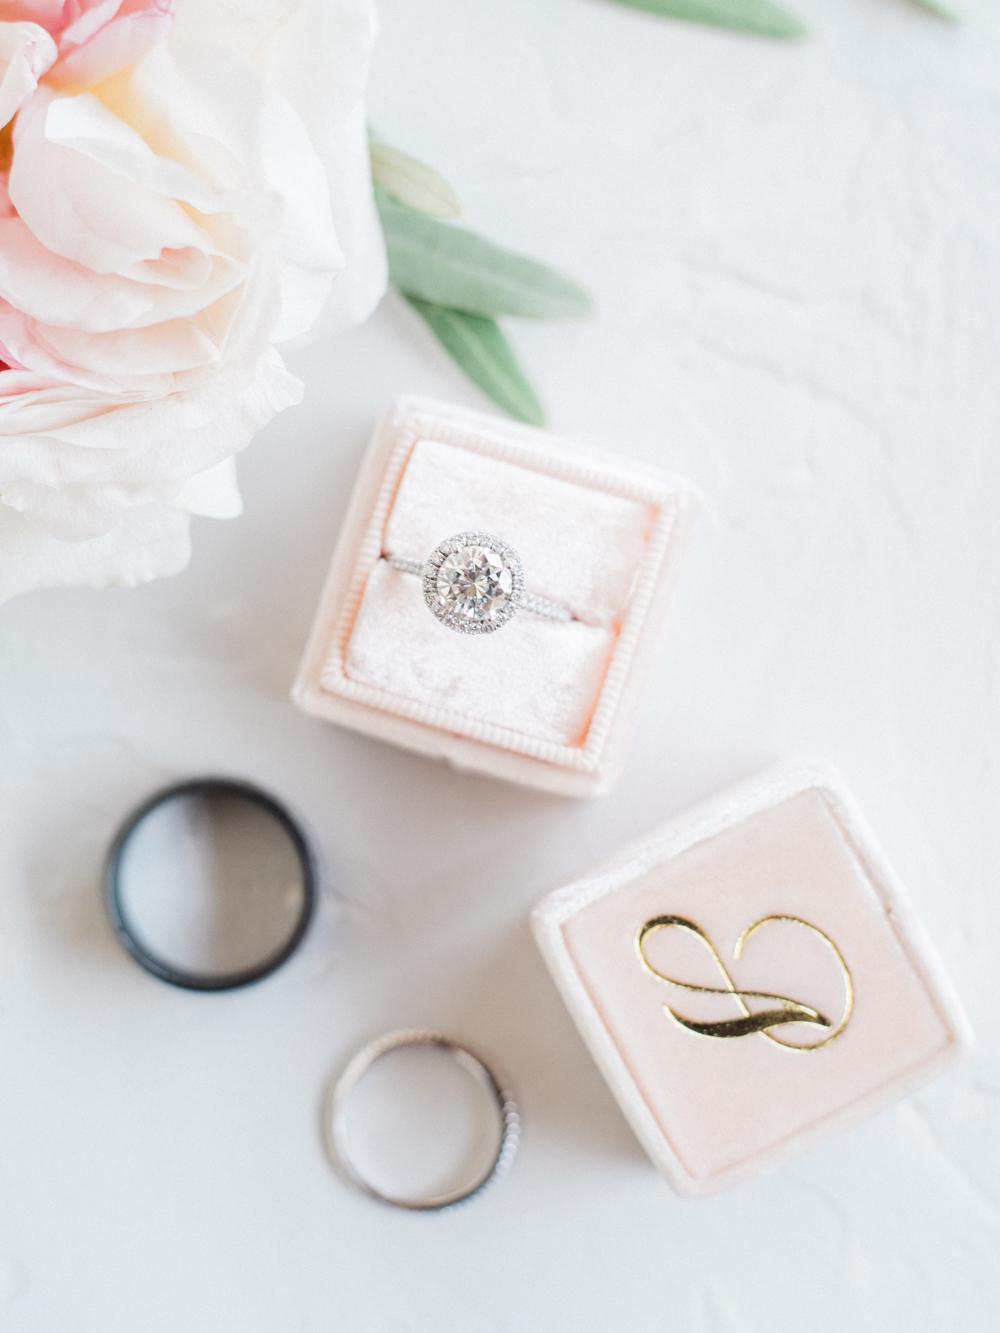 Mrs Box | Mount Palomar Winery Wedding | Blush and Lavender | San Diego wedding photographer | Temecula wedding photographer | Southern California film photographer | Whiskers and Willow Photography